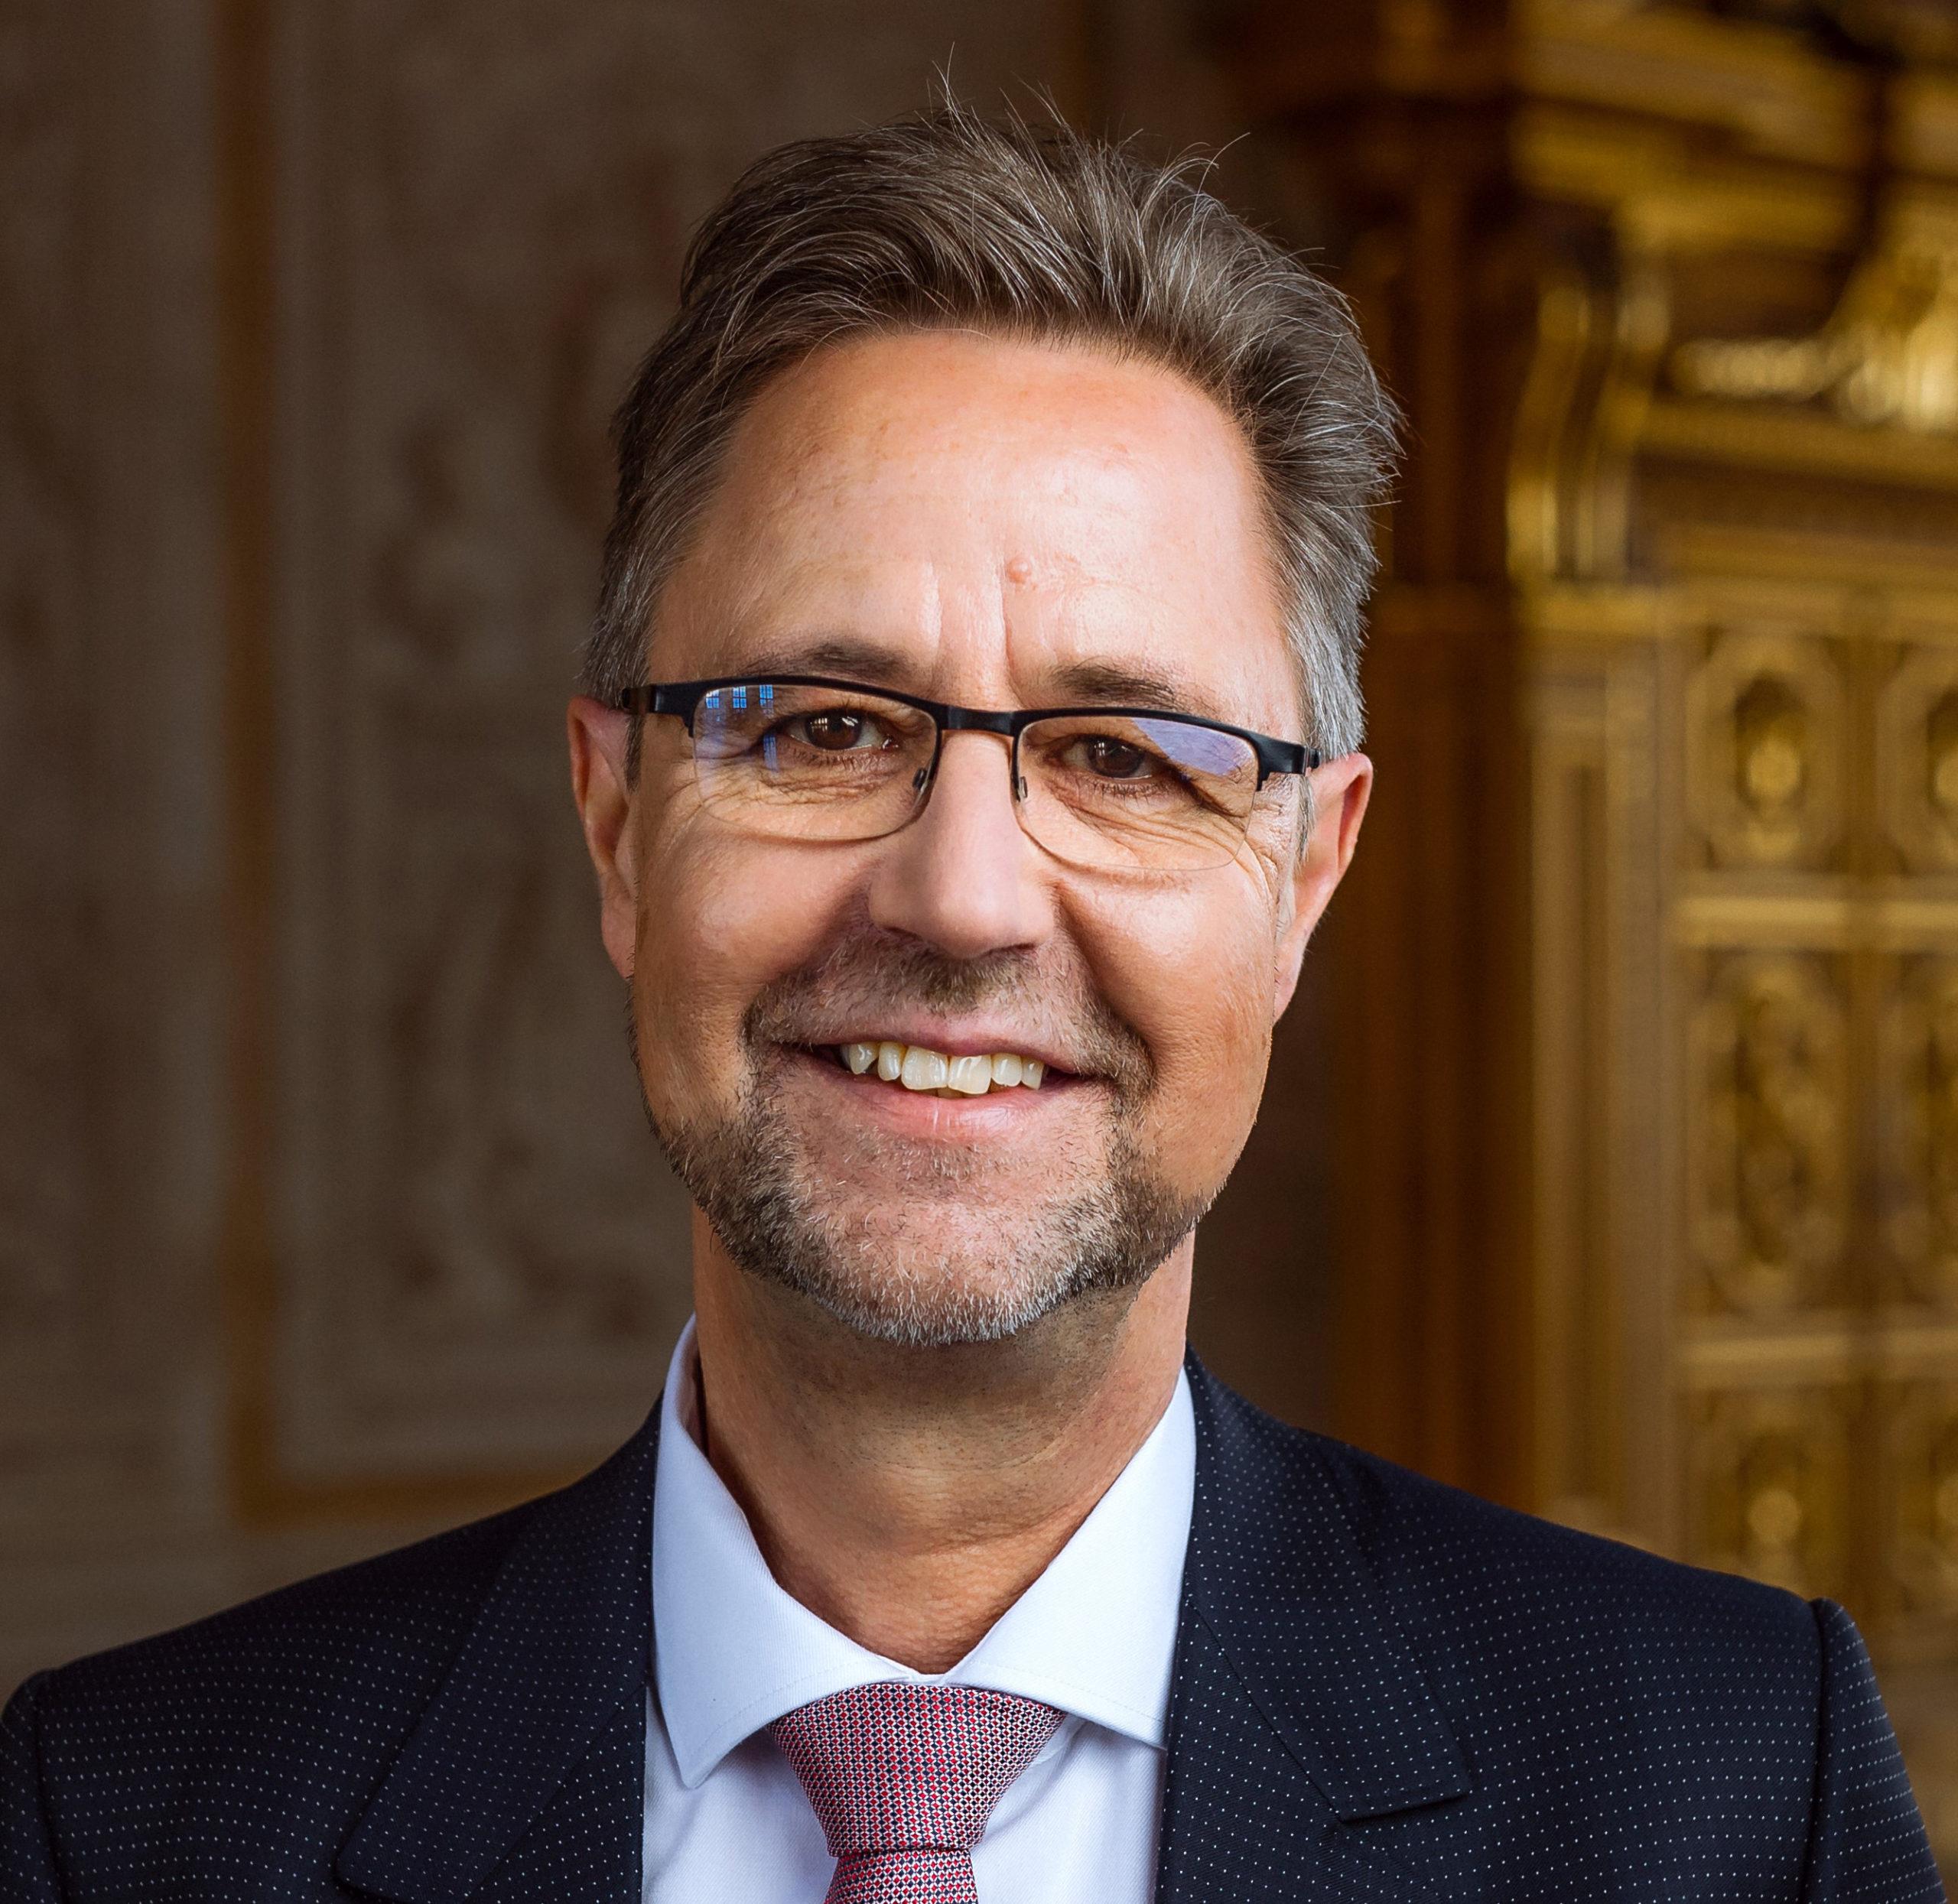 Gerd Merkle